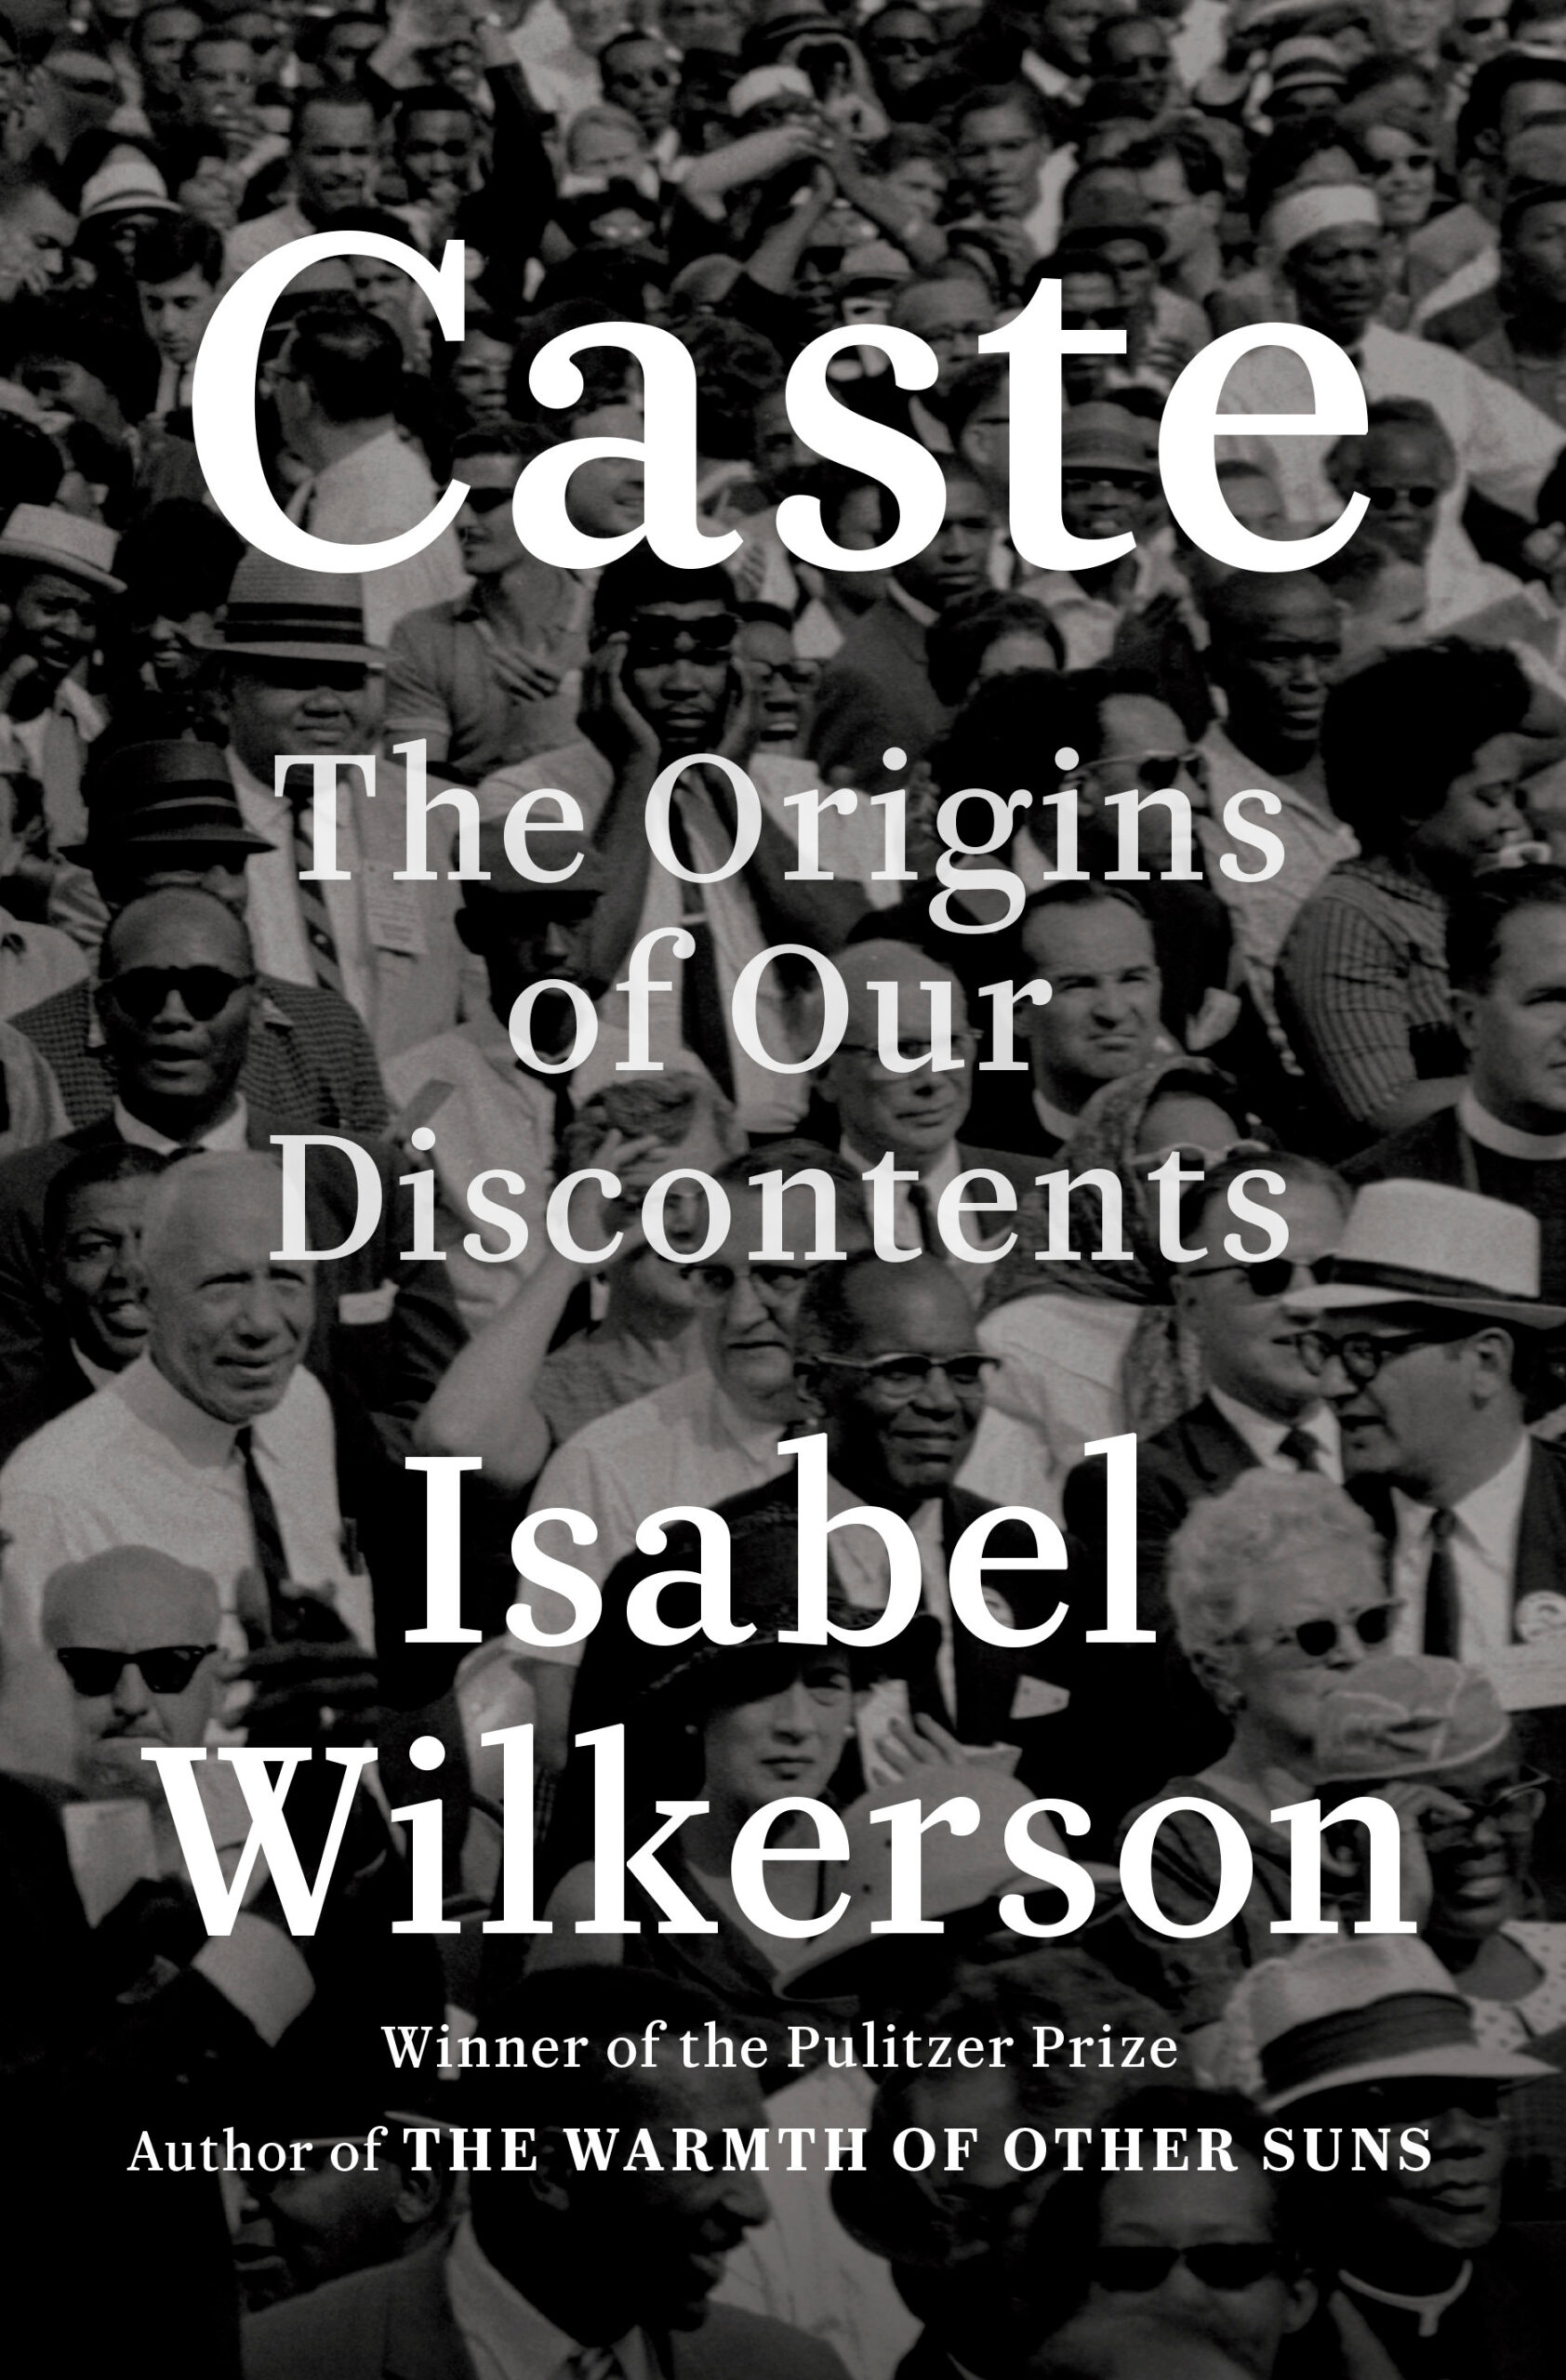 Caste- The Origins of Our Discontent